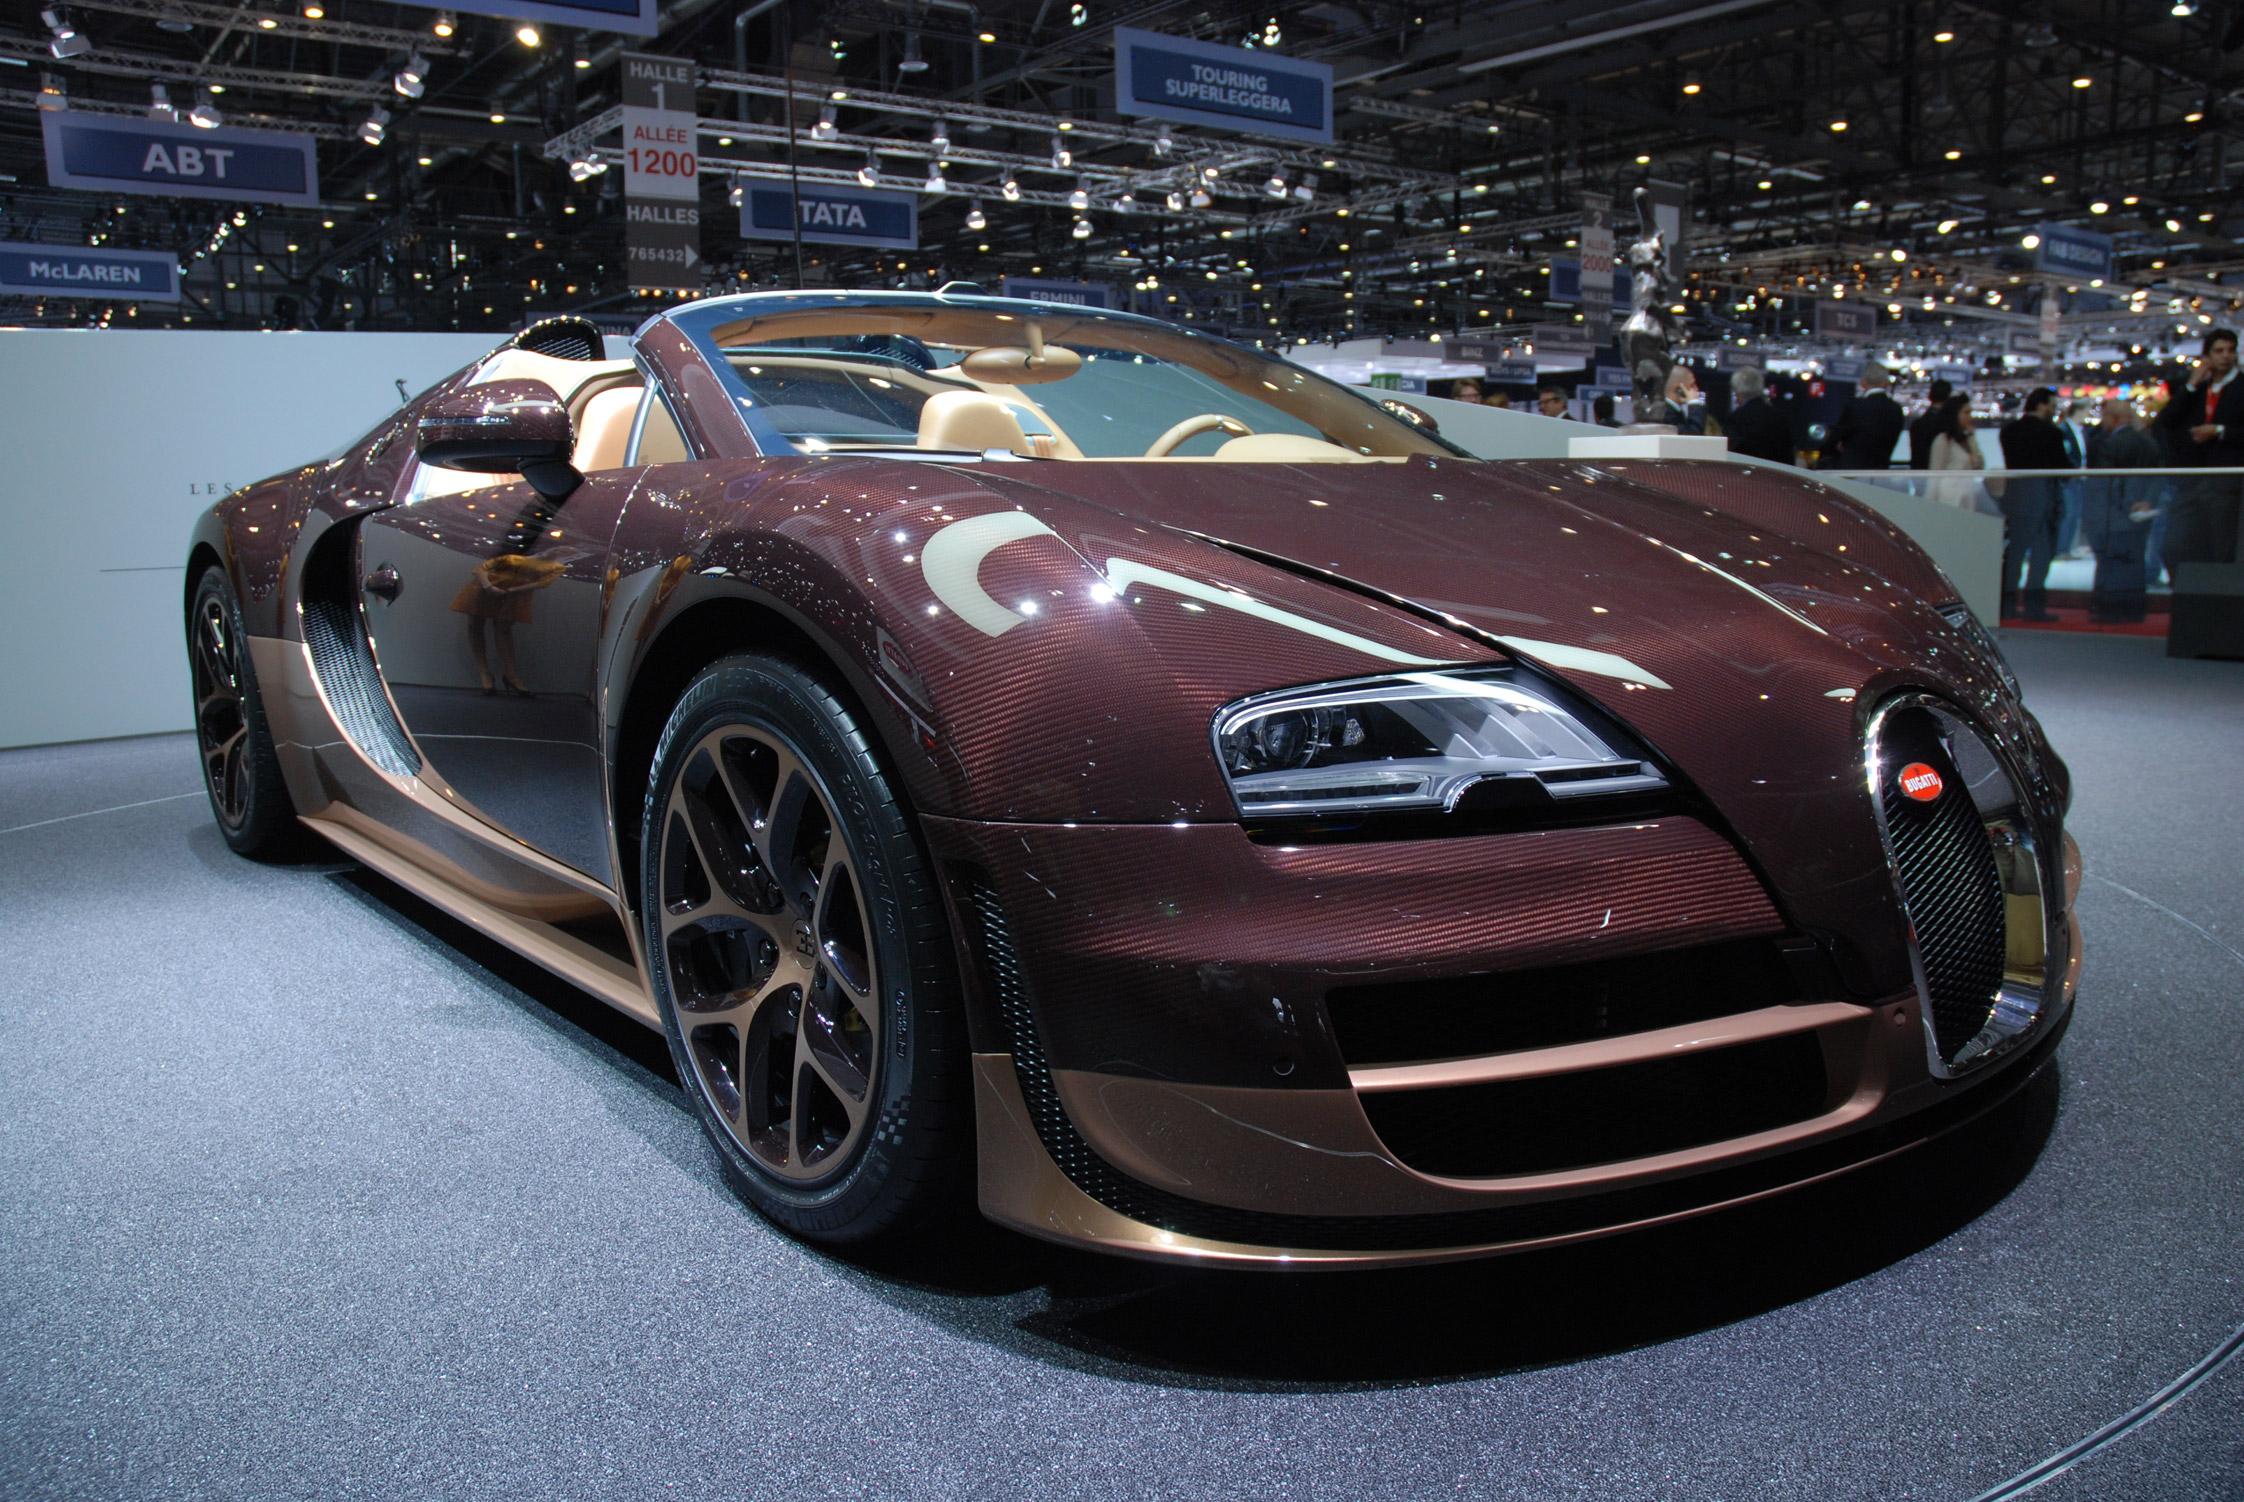 photo bugatti veyron 16 4 grand sport vitesse rembrandt cabriolet 2014 m diatheque. Black Bedroom Furniture Sets. Home Design Ideas